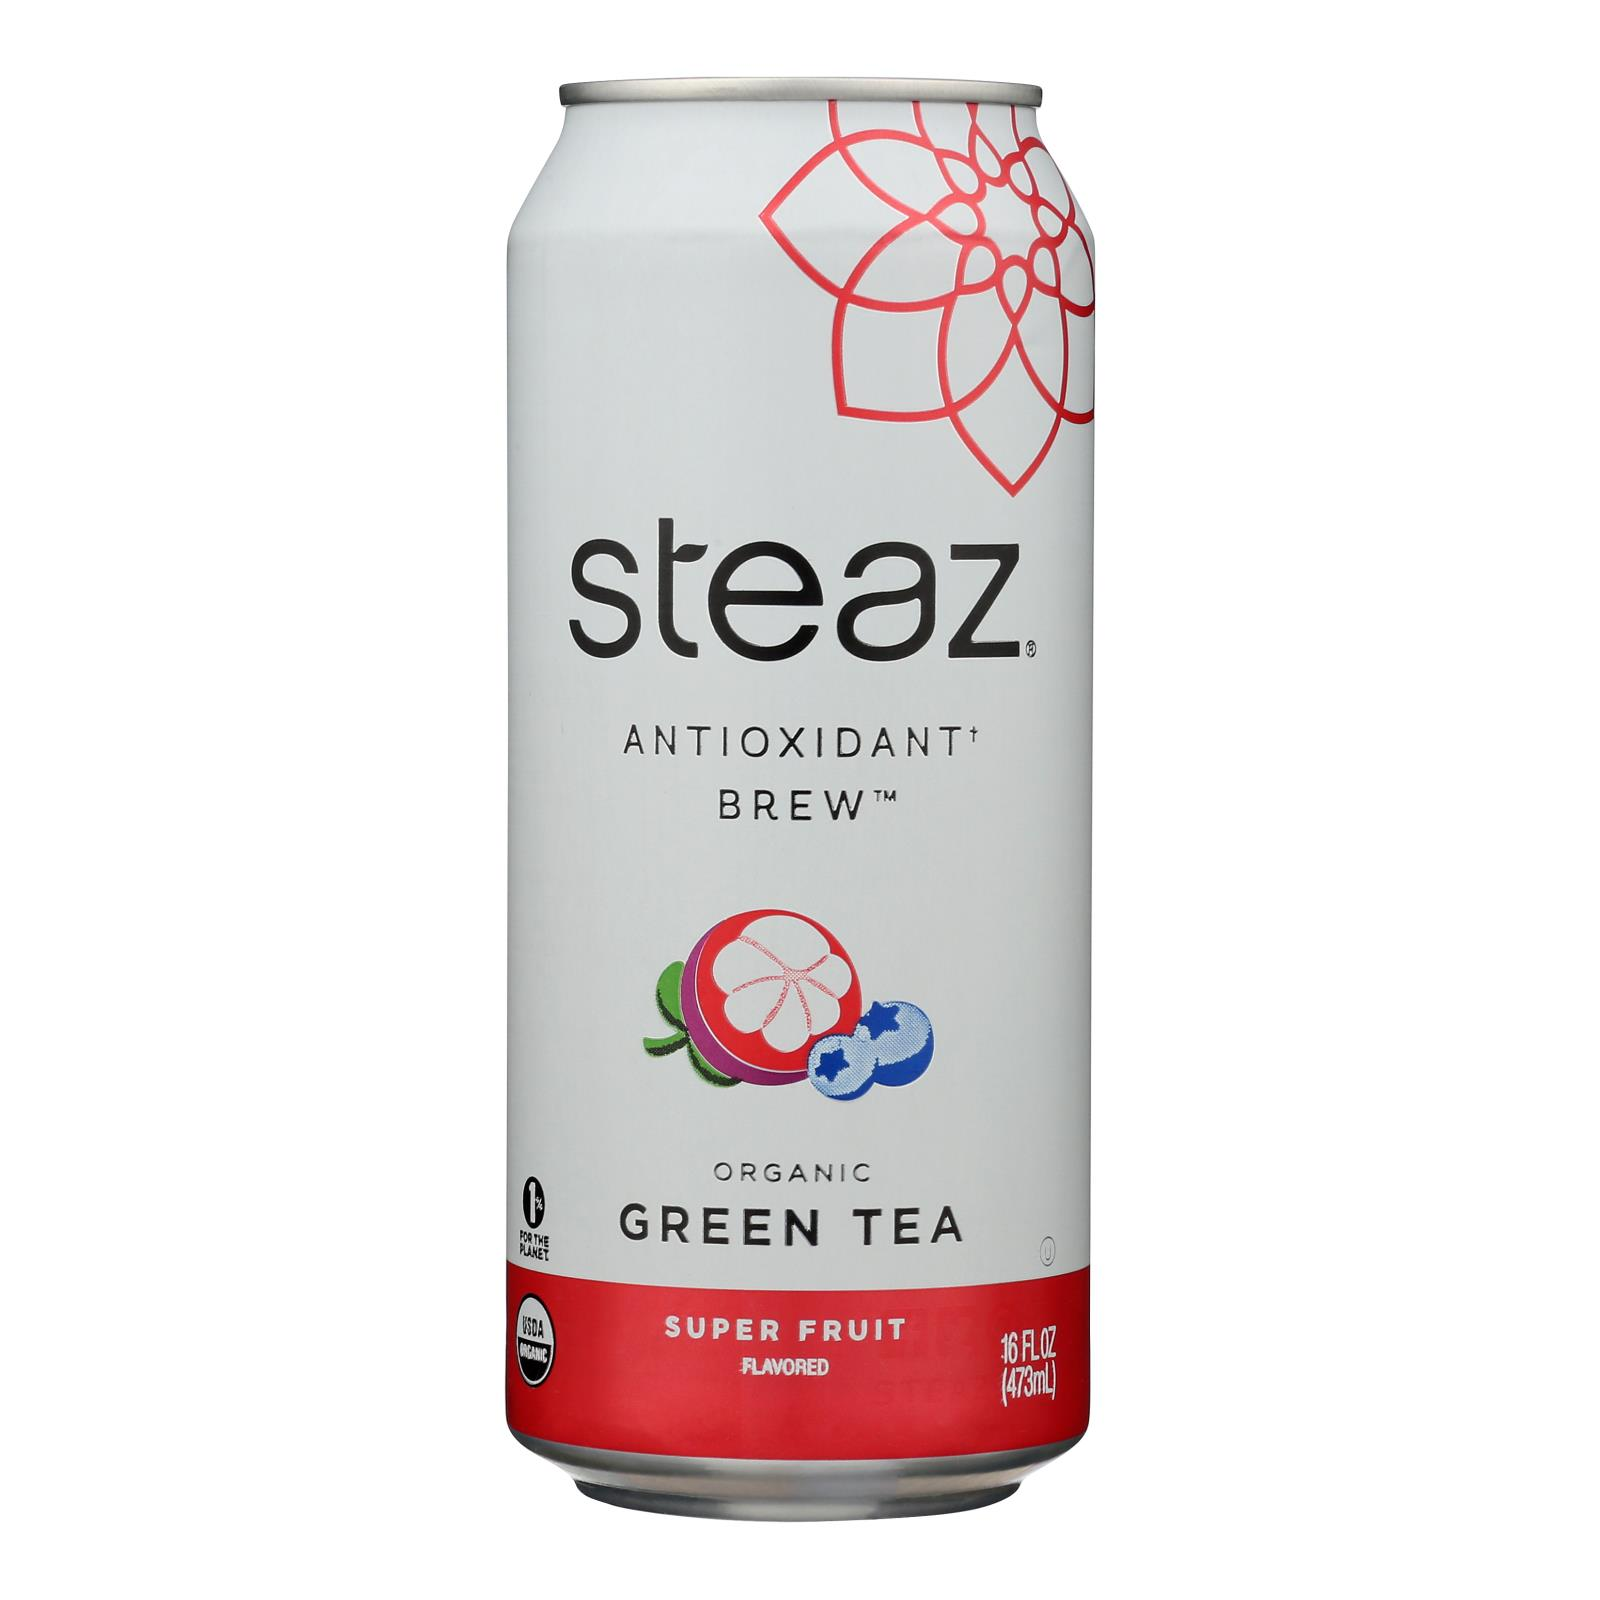 Steaz Lightly Sweetened Green Tea - Super Fruit - Case of 12 - 16 Fl oz.